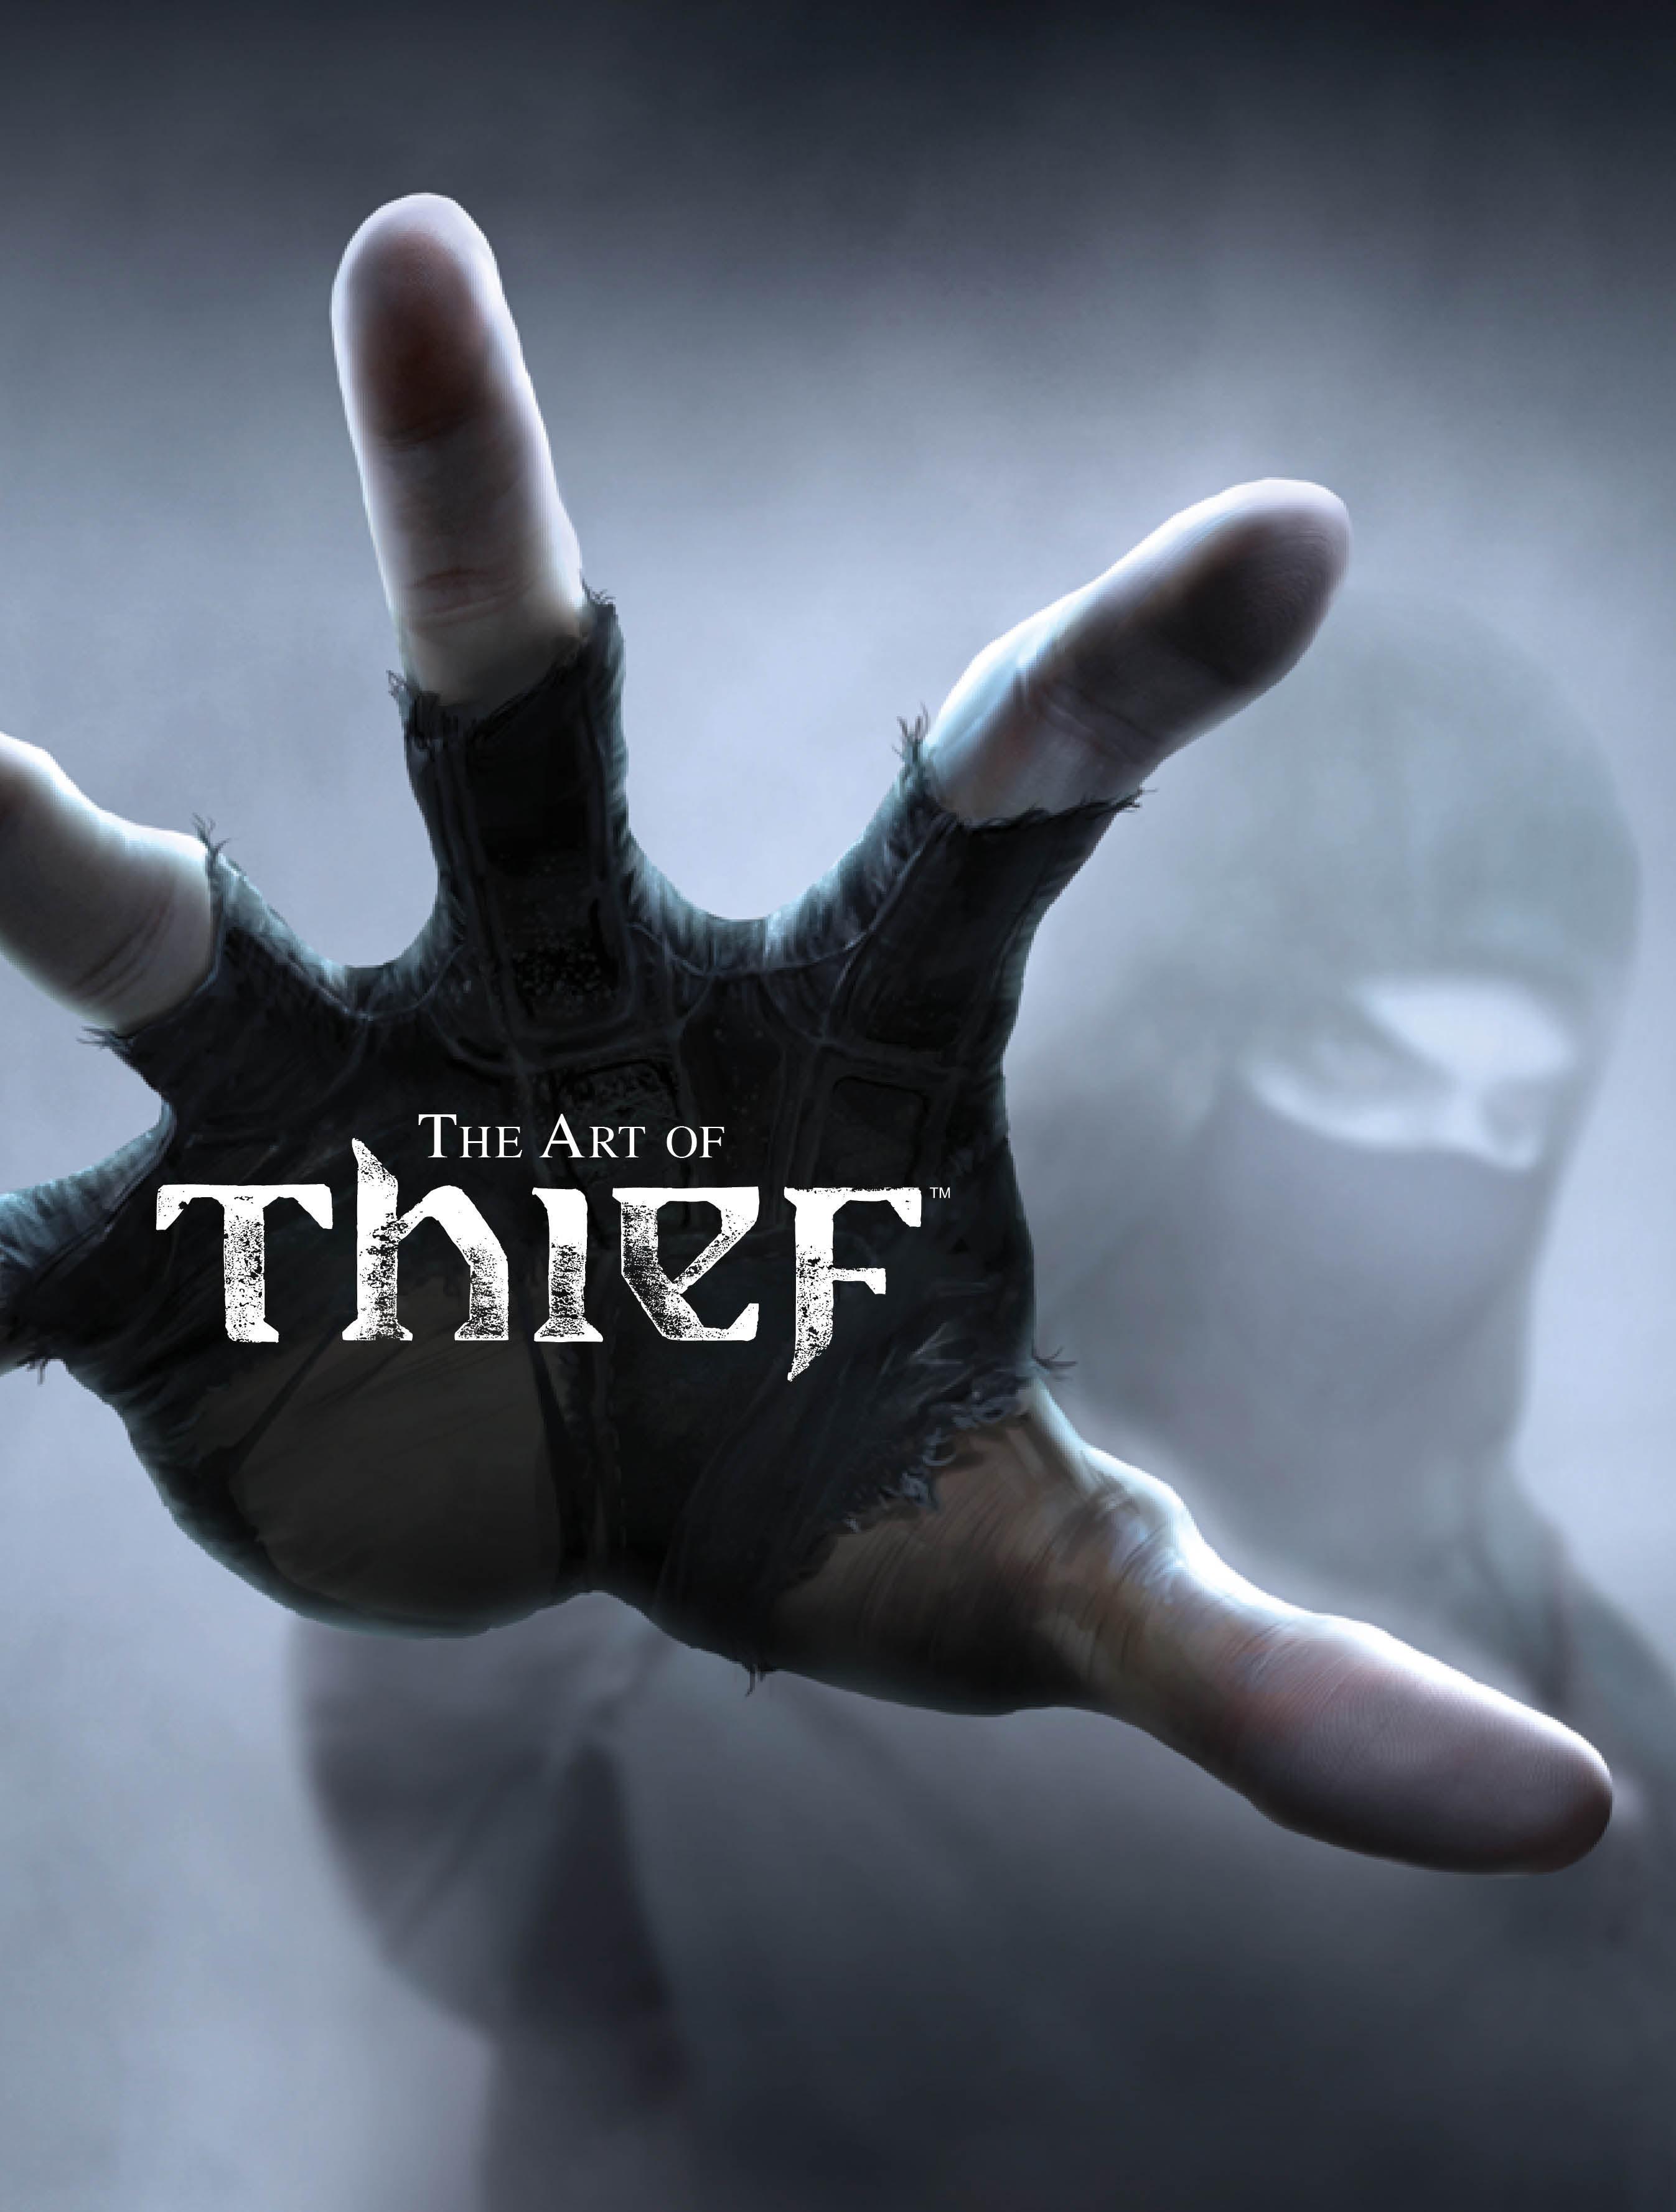 titan books   u201cthe art of thief u201d awakens our inner